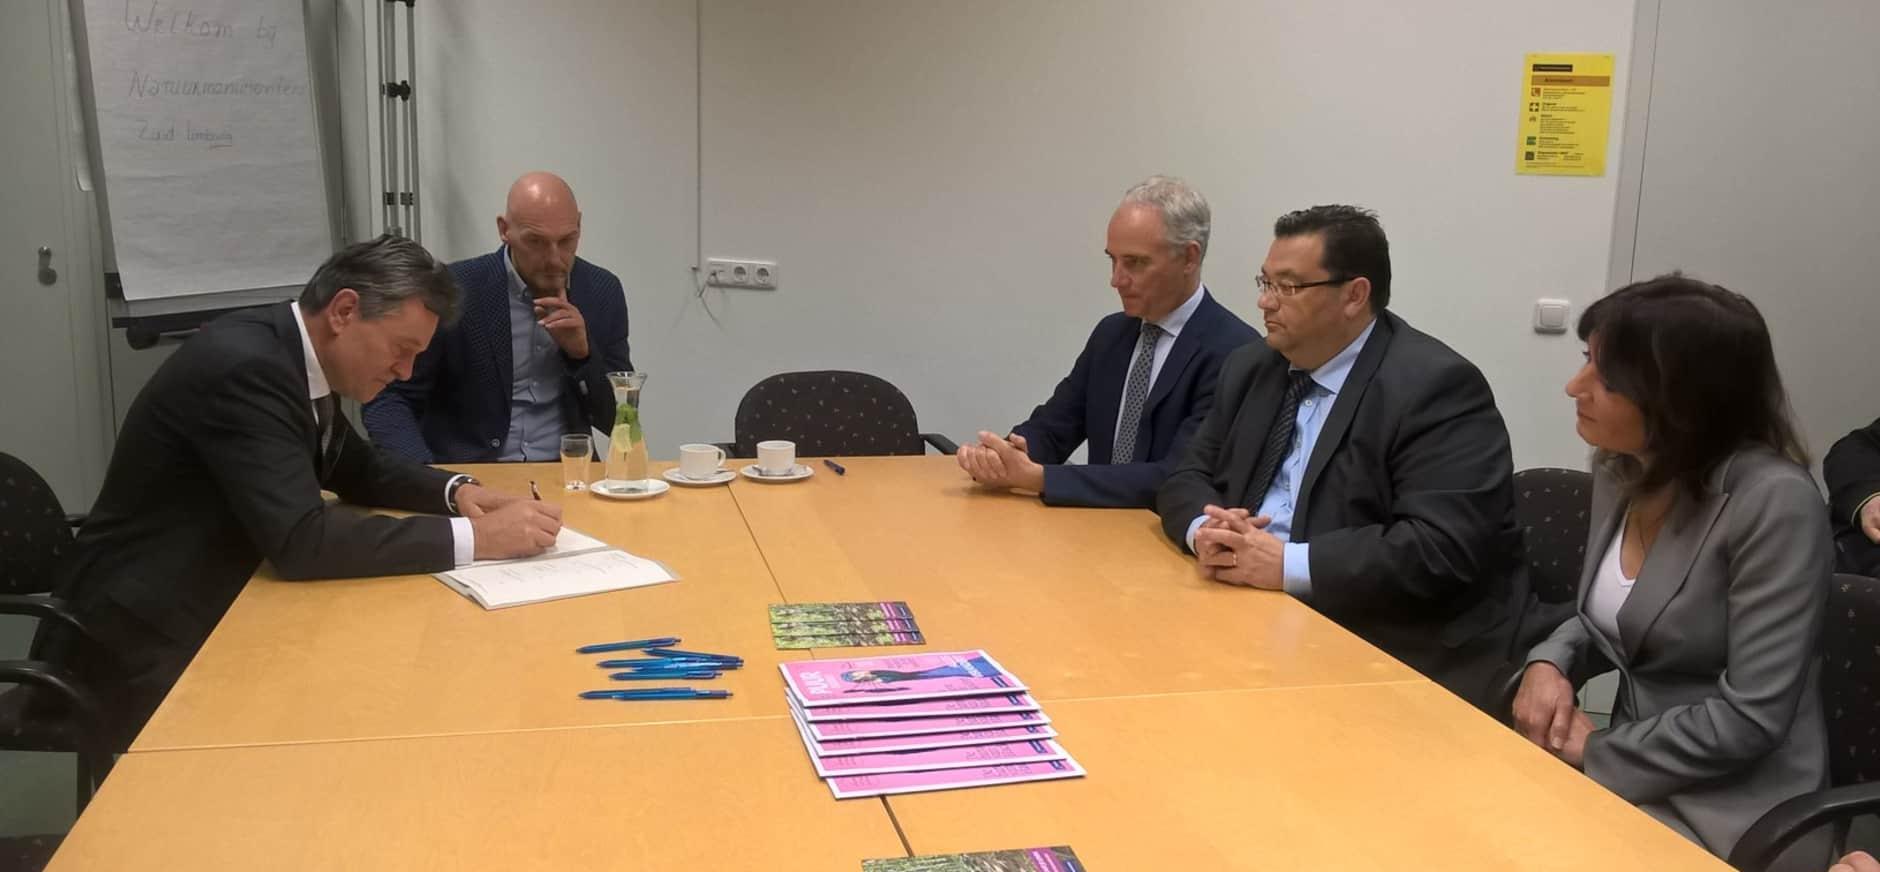 Samenwerking toezicht Parkstad Limburg